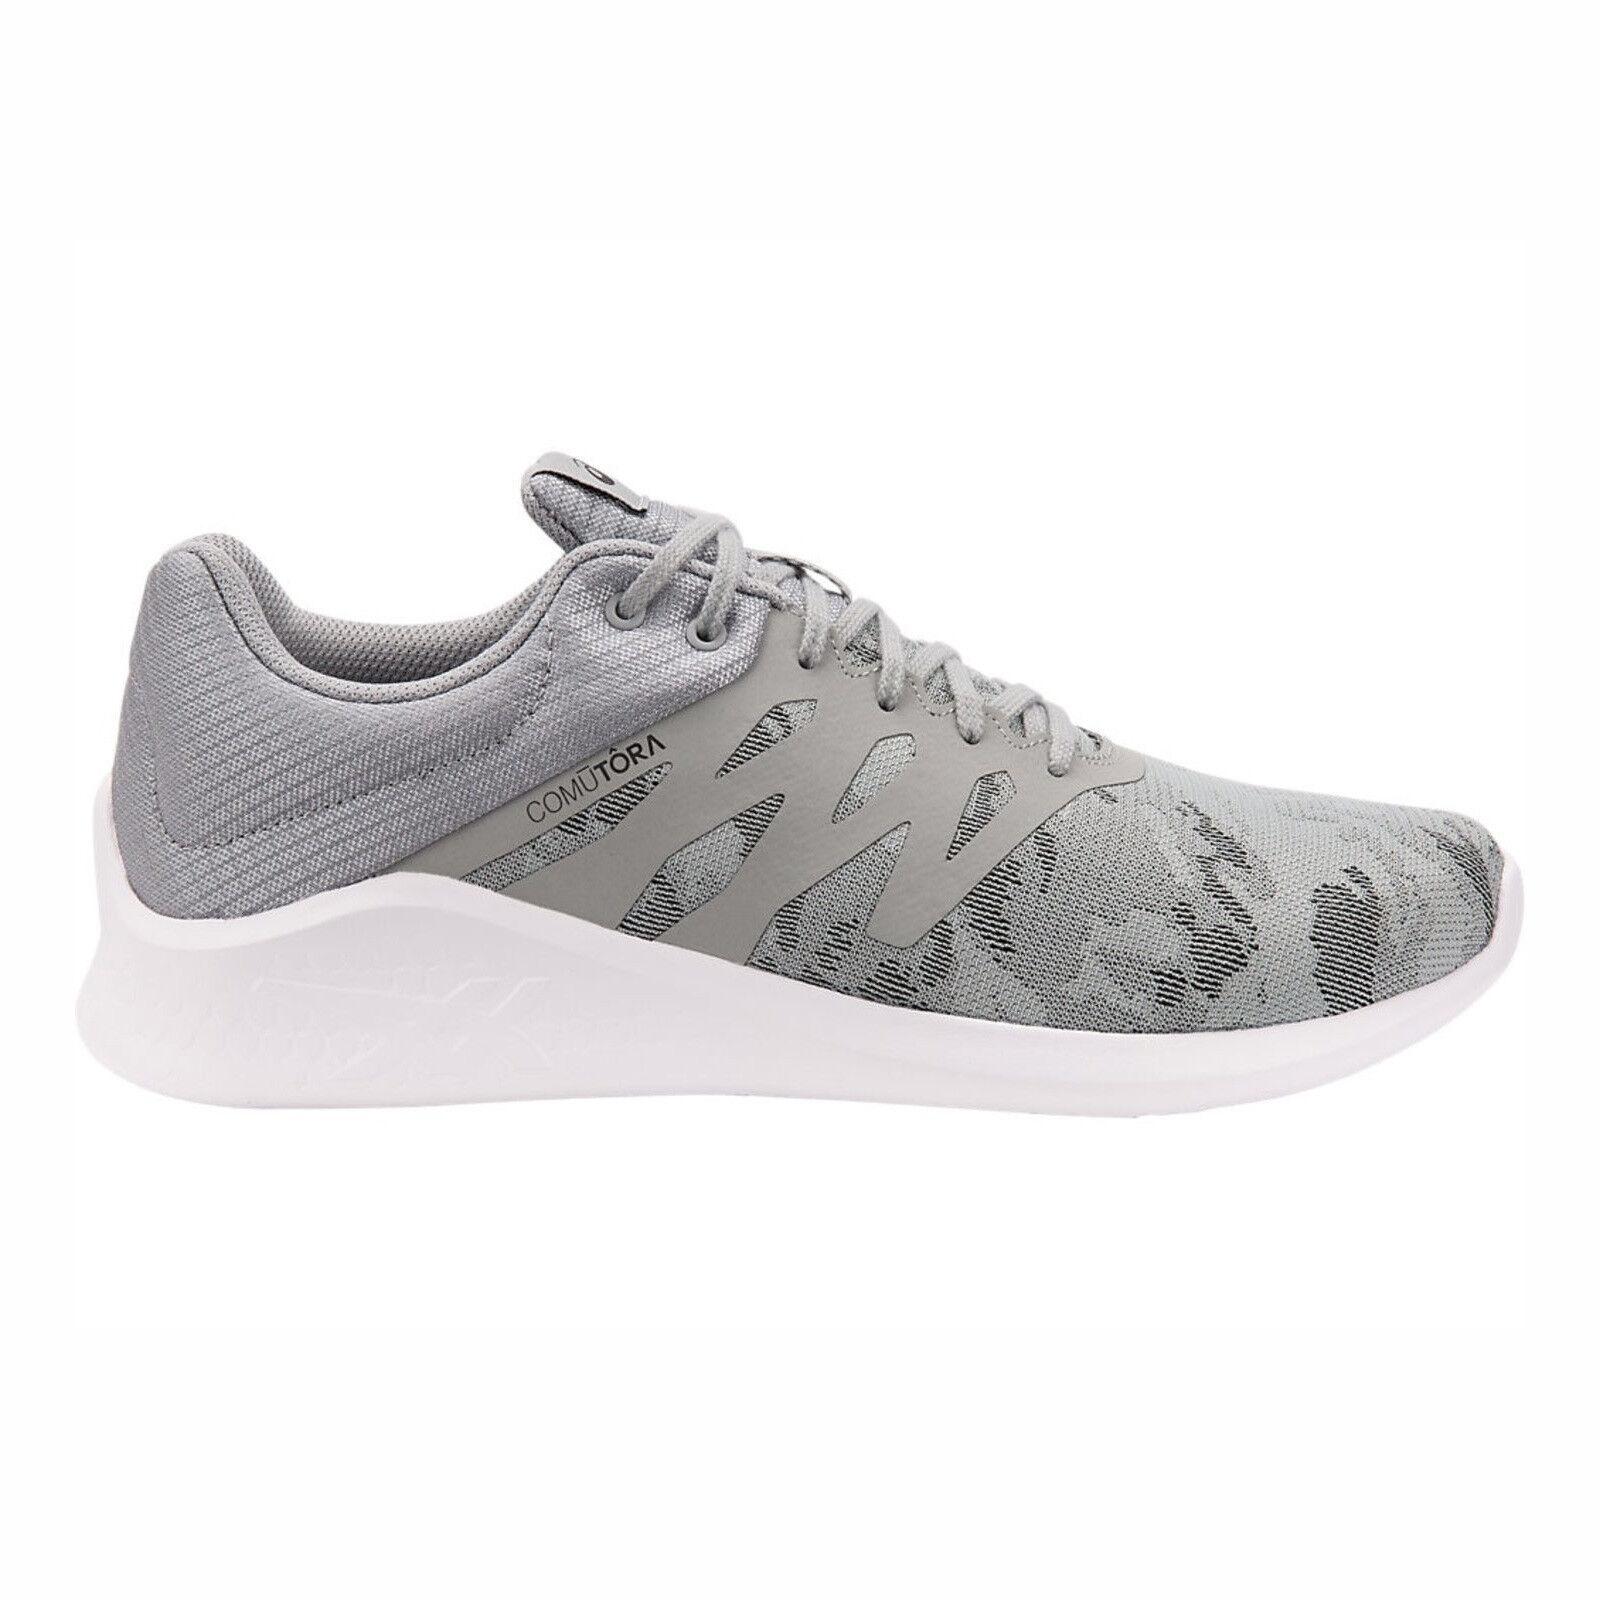 Asics Comutora MX [1021A013-020] Men Running Shoes Stone Grey